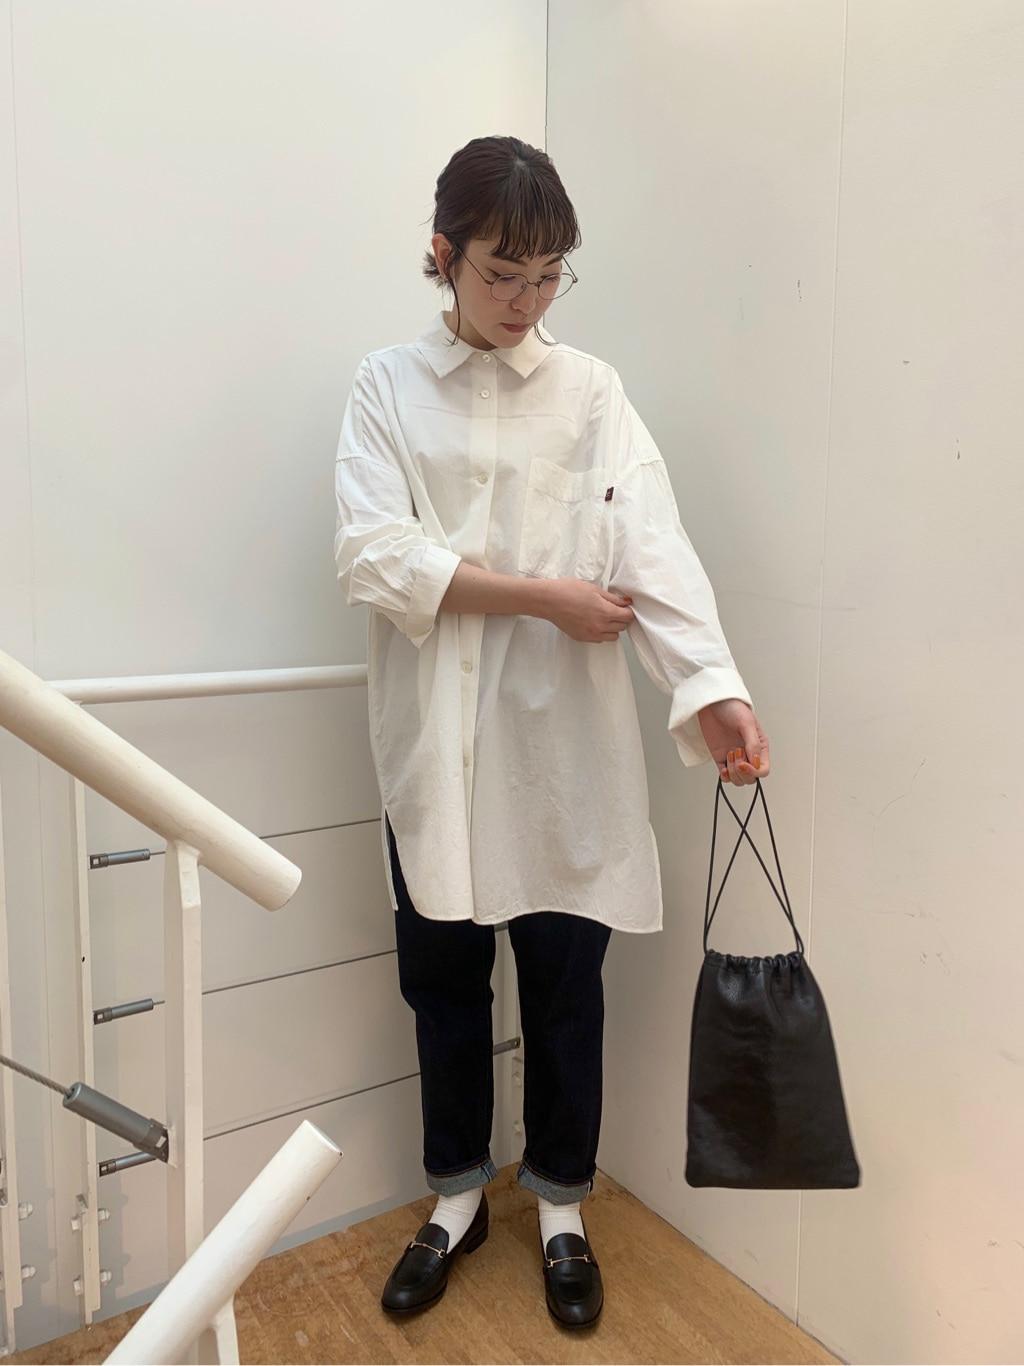 l'atelier du savon 名古屋栄路面 身長:161cm 2021.04.07